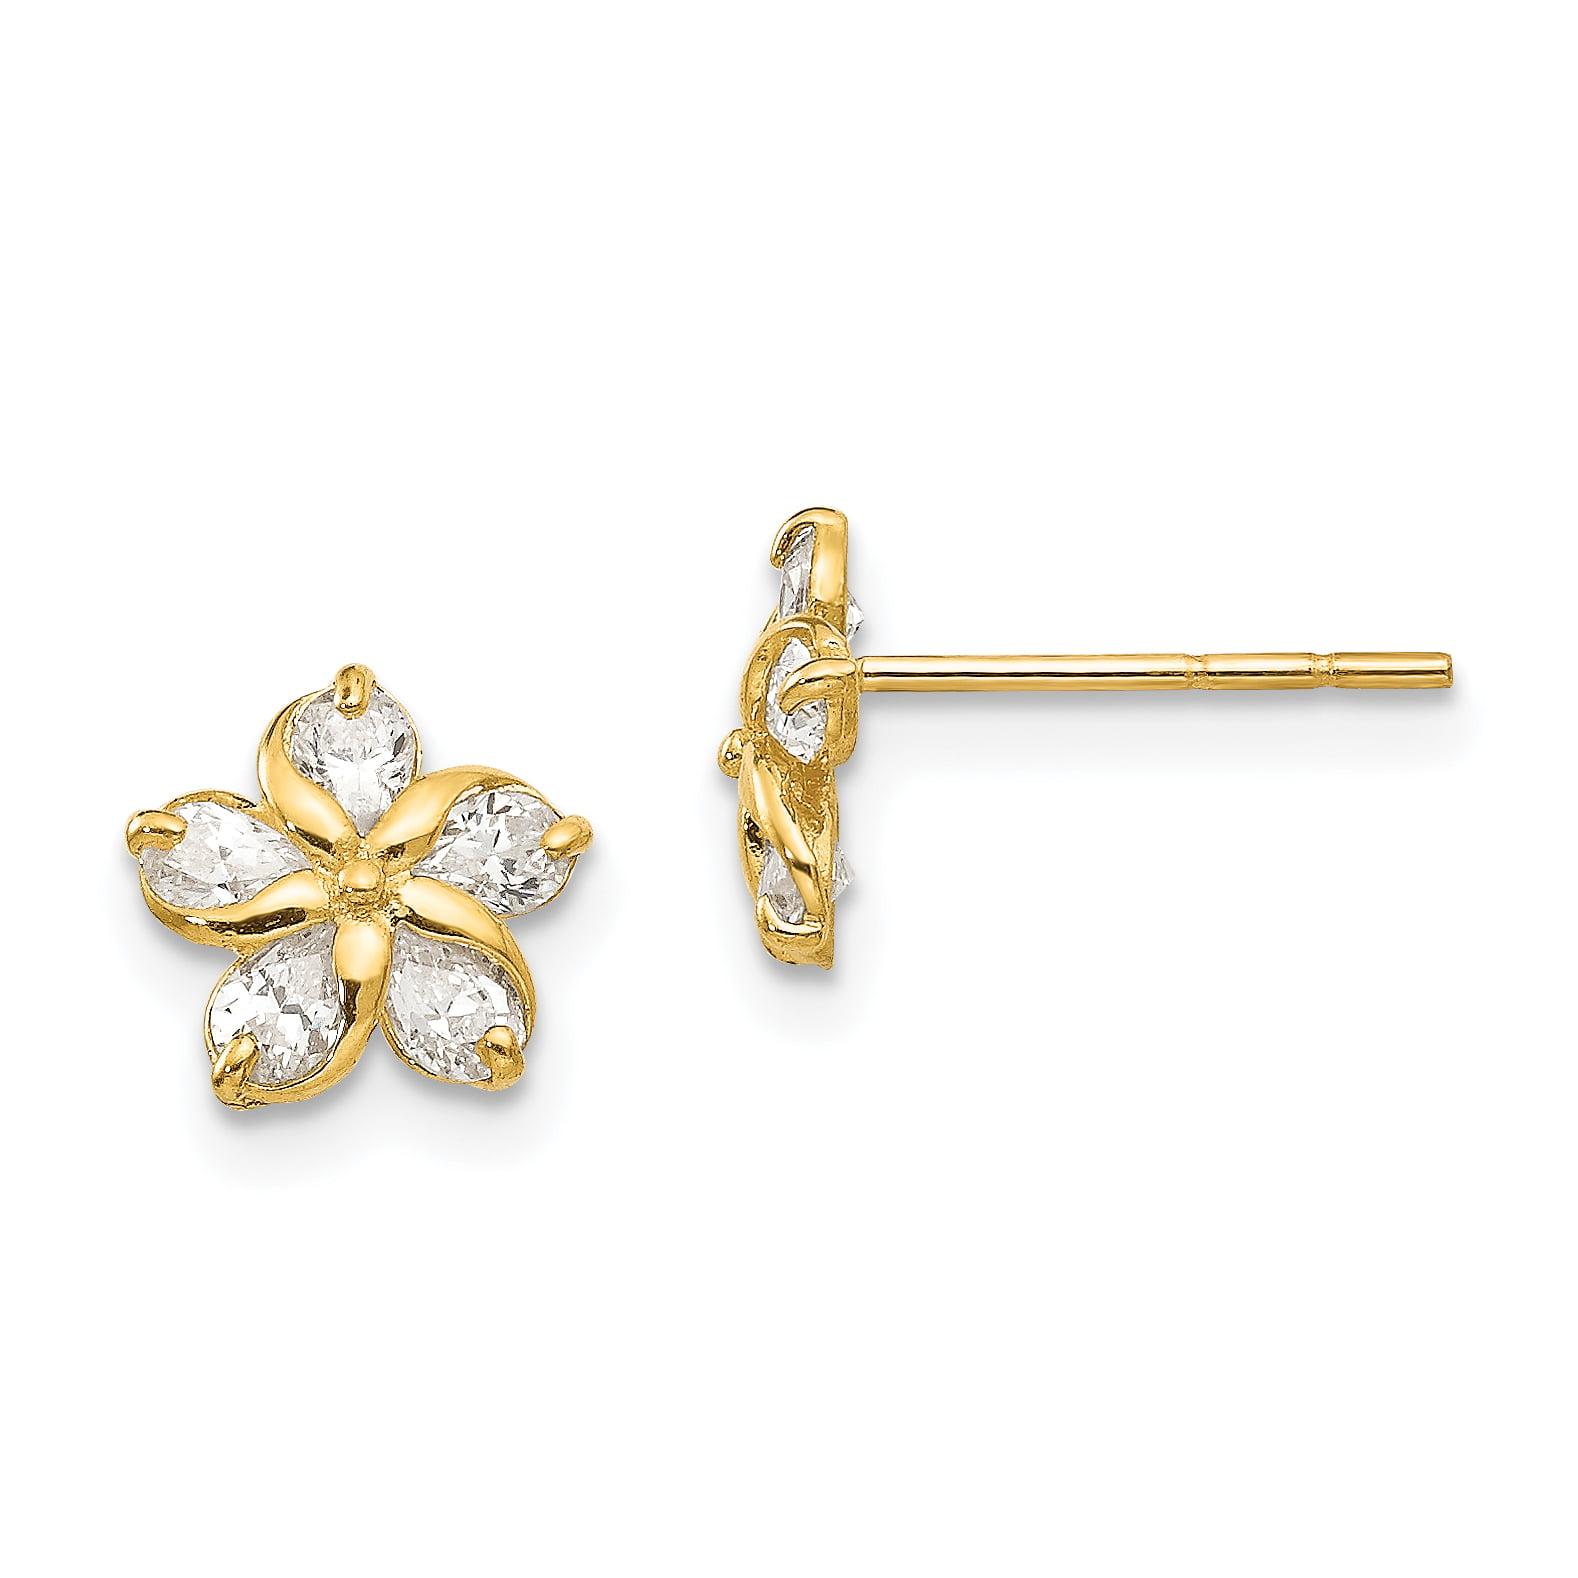 14K Yellow Gold Madi K Childrens 4.8 MM CZ Key Post Stud Earrings